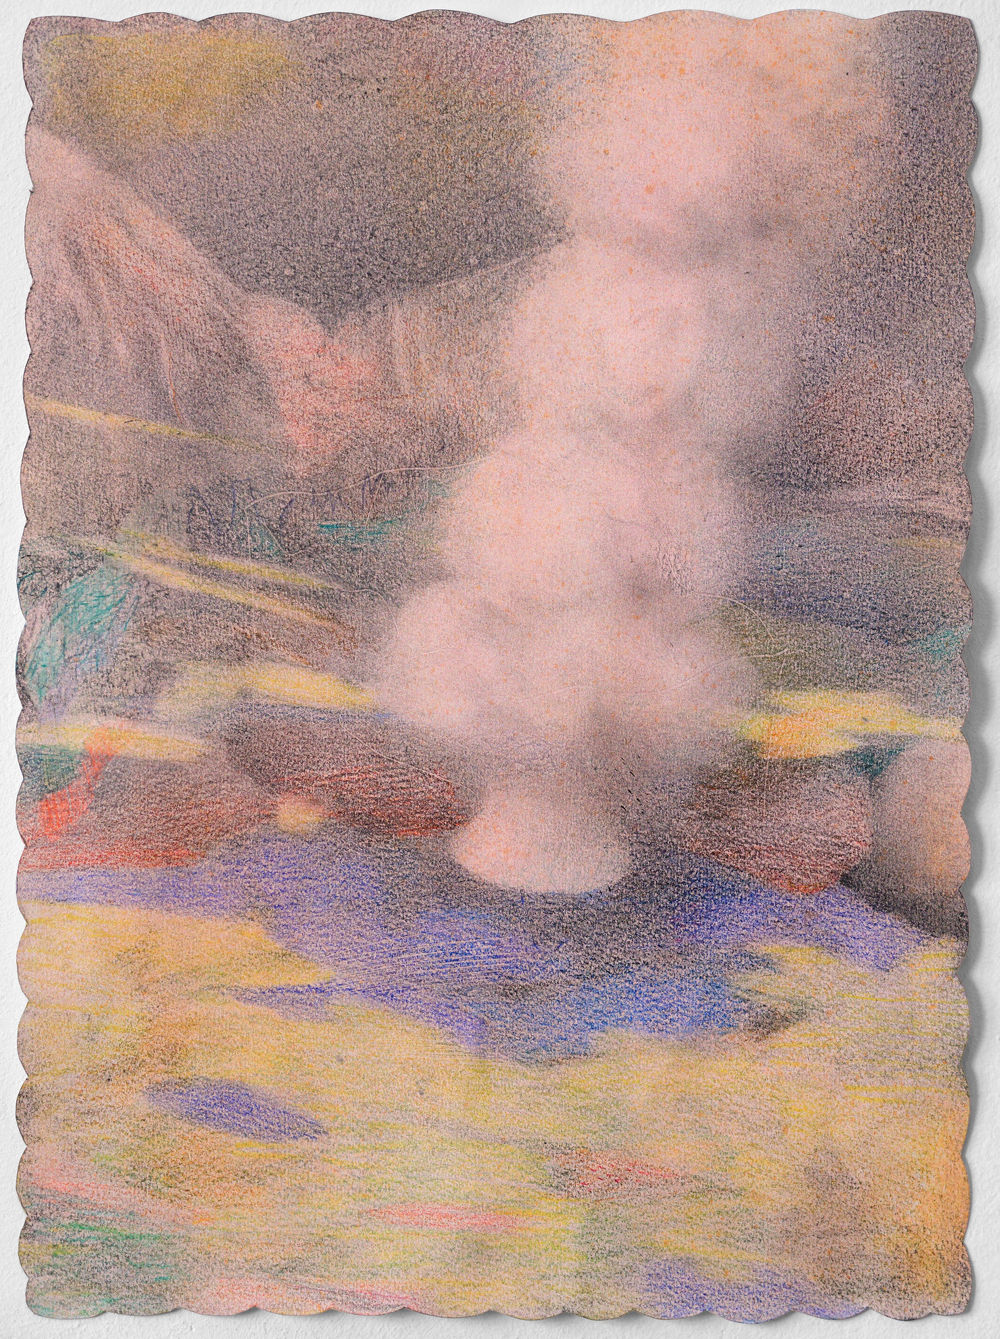 Corentin Grossmann, courtesy galerie Jeanroch Dard